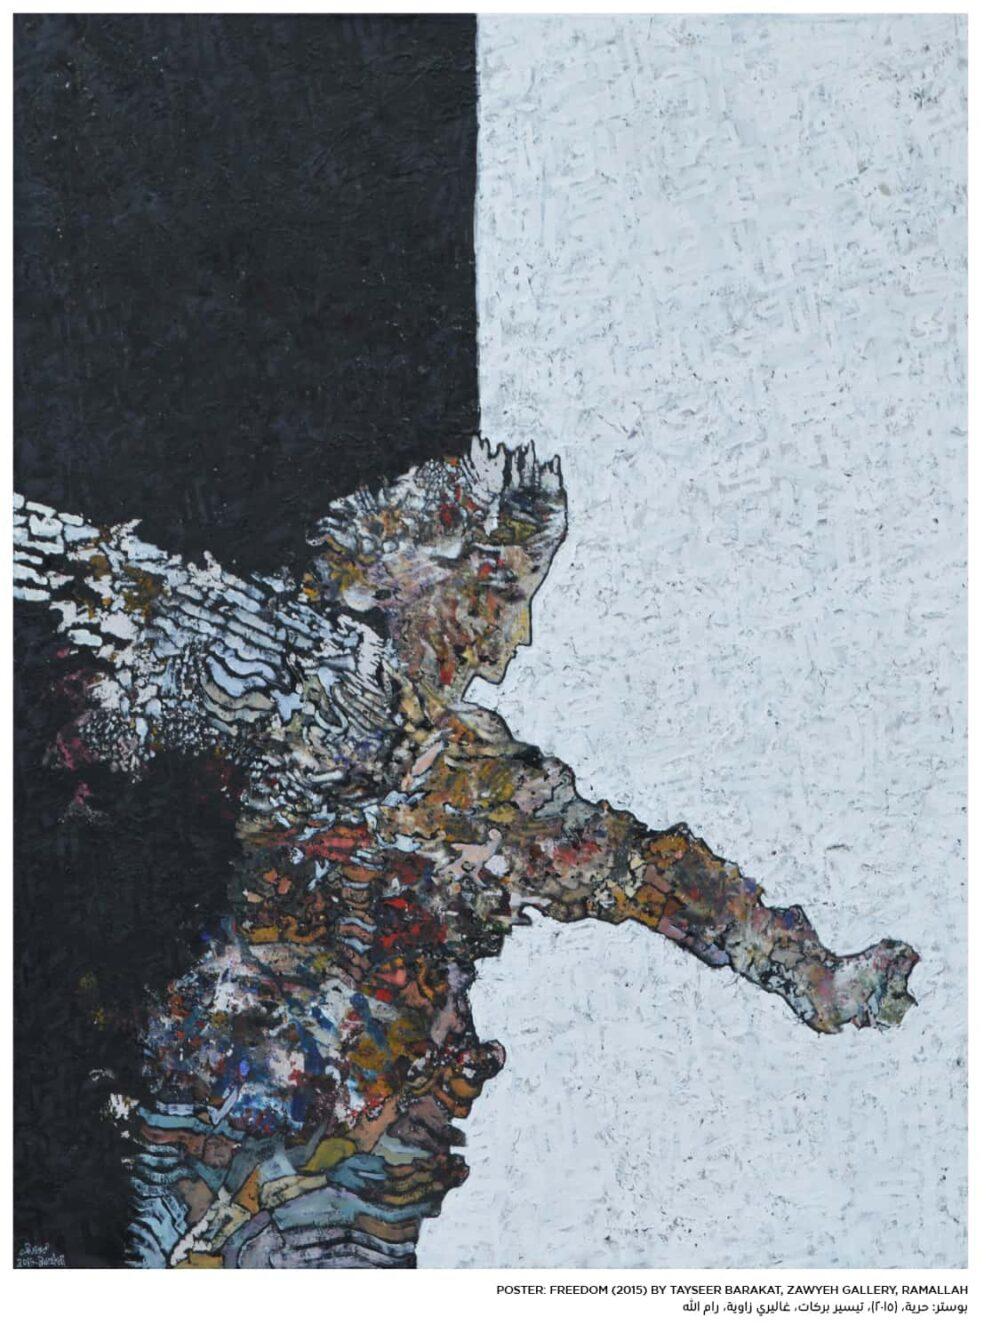 Freedom #1 by Tayseer Barakat